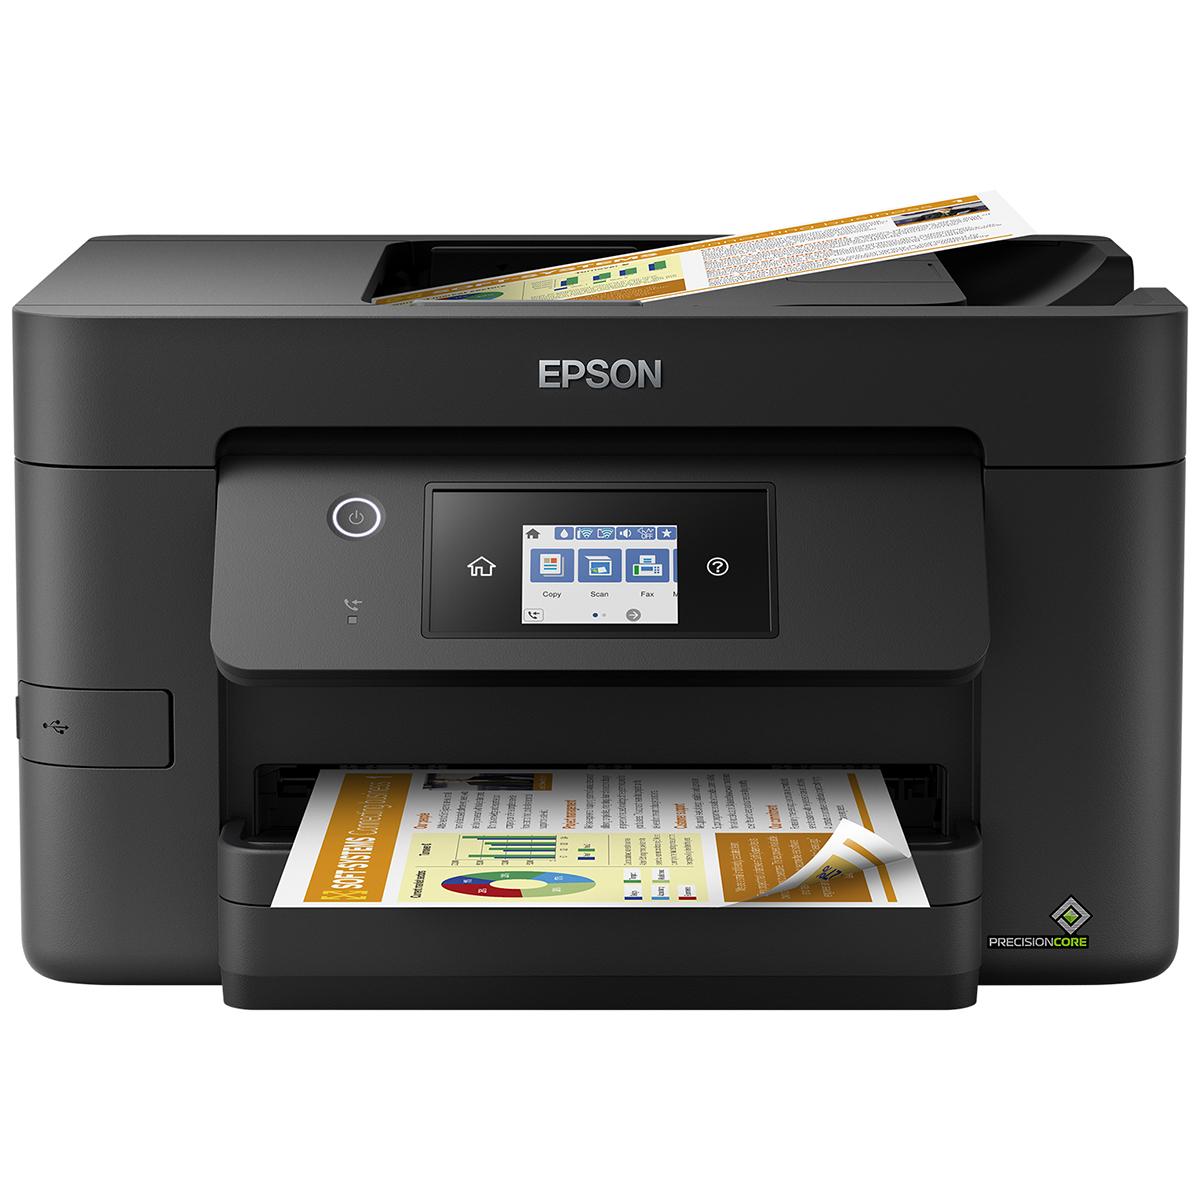 Epson WorkForce PRO WF-3820DWF A4 Colour Inkjet Multifunction